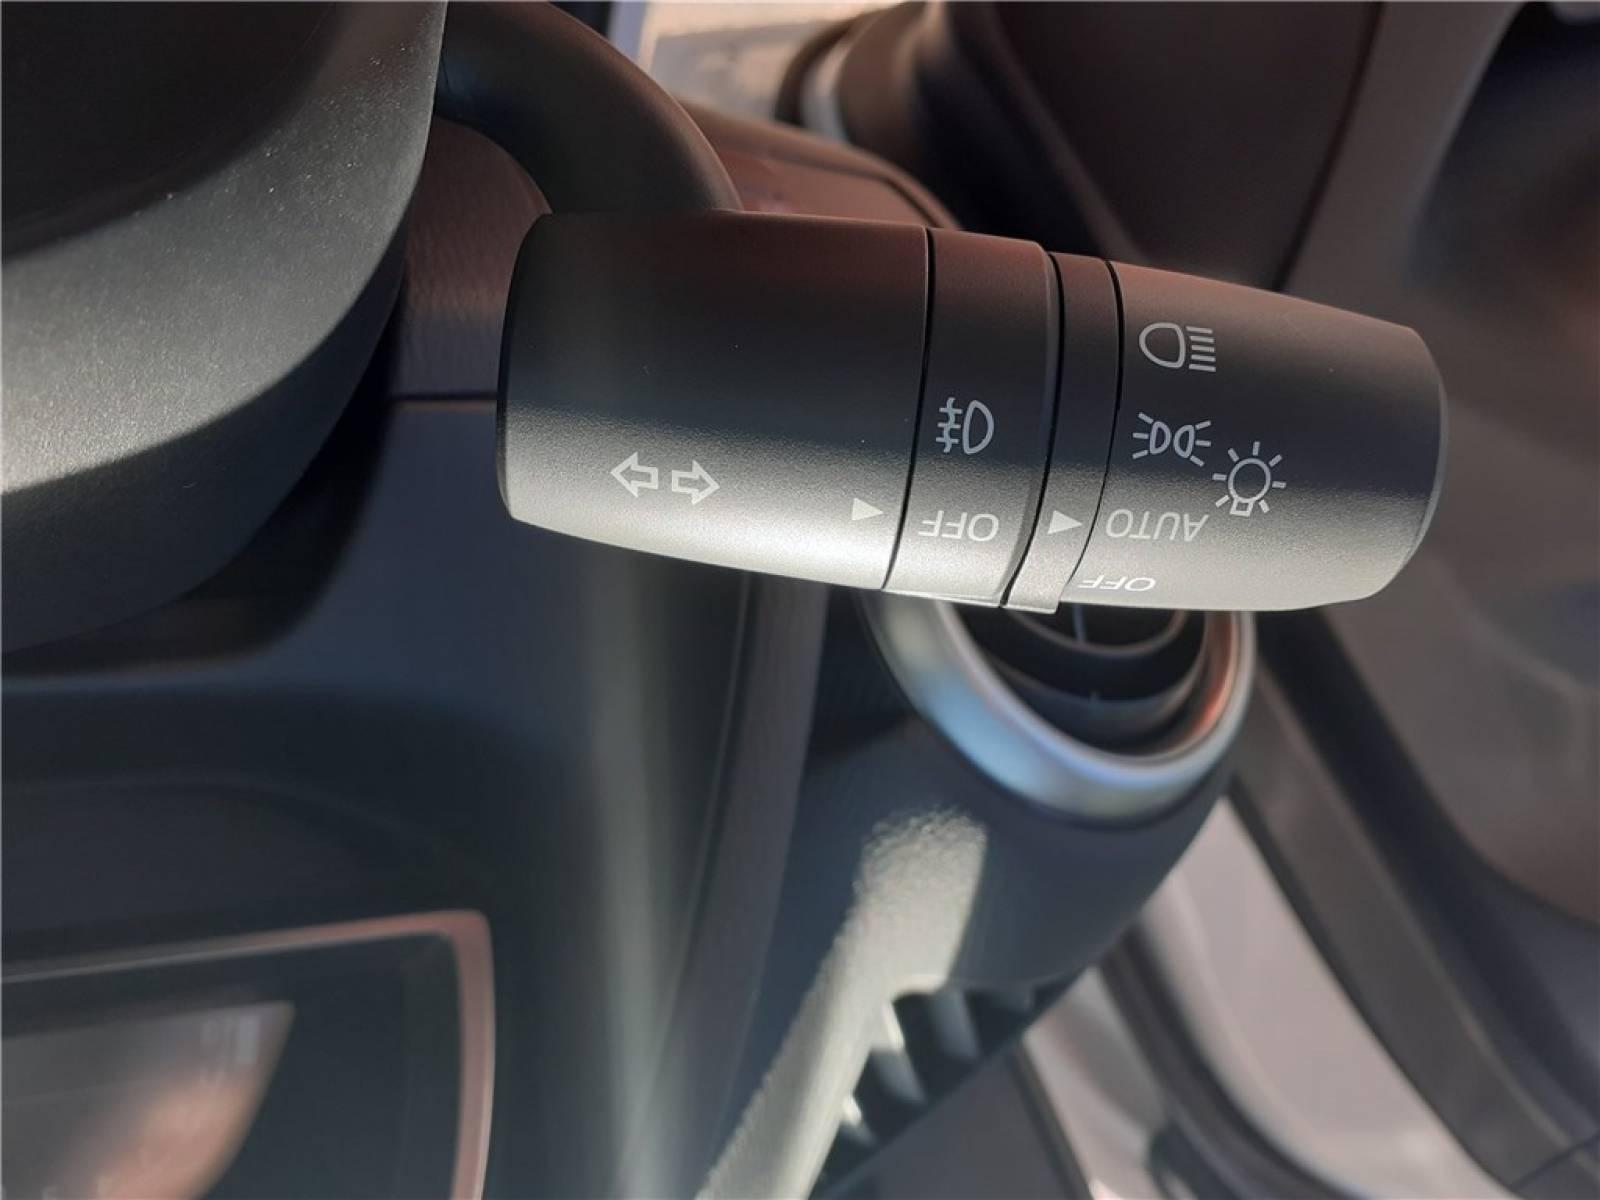 MAZDA Mazda2 1.5L SKYACTIV-G M Hybrid 90ch - véhicule d'occasion - Groupe Guillet - Chalon Automobiles - 71100 - Chalon-sur-Saône - 42